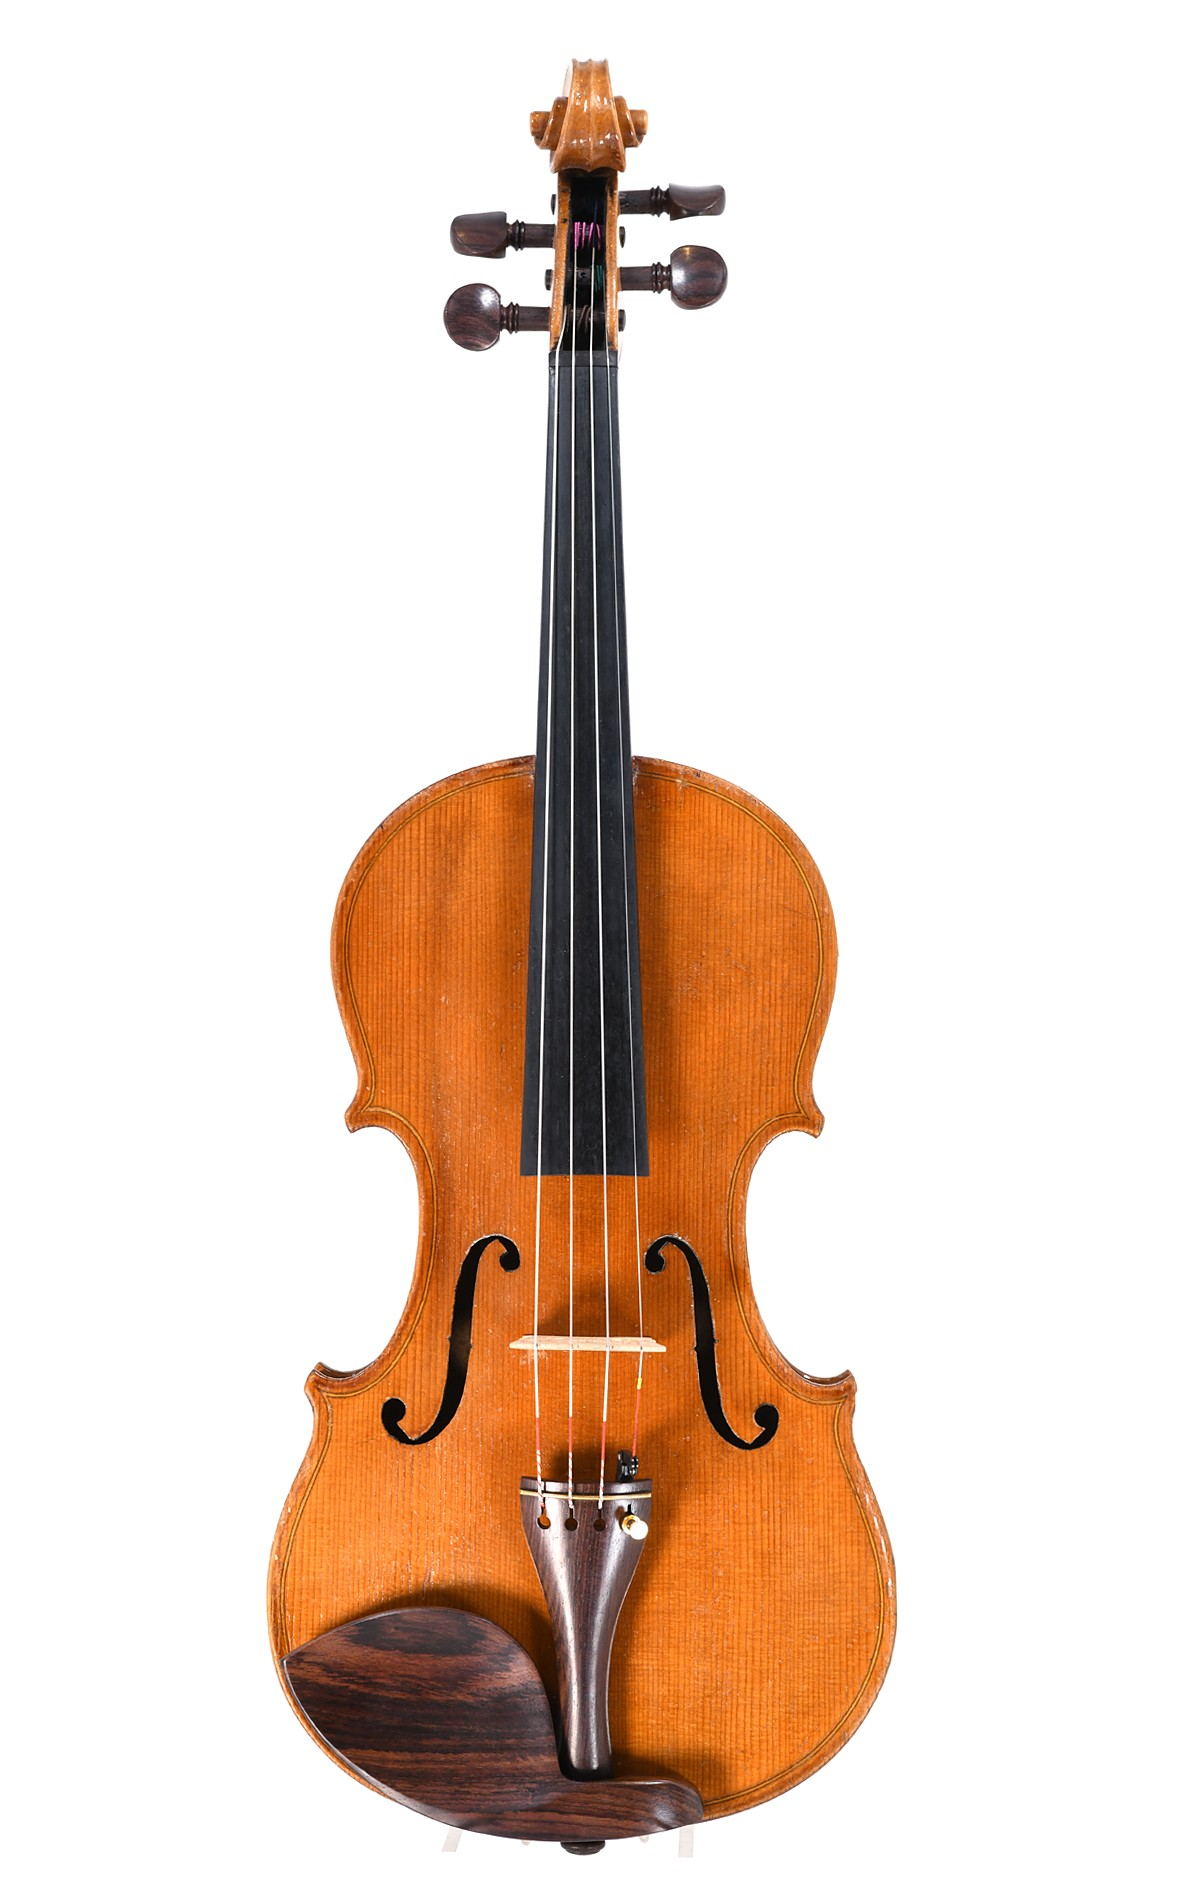 Old Markneukirchen violin with a warm sound, 1930's